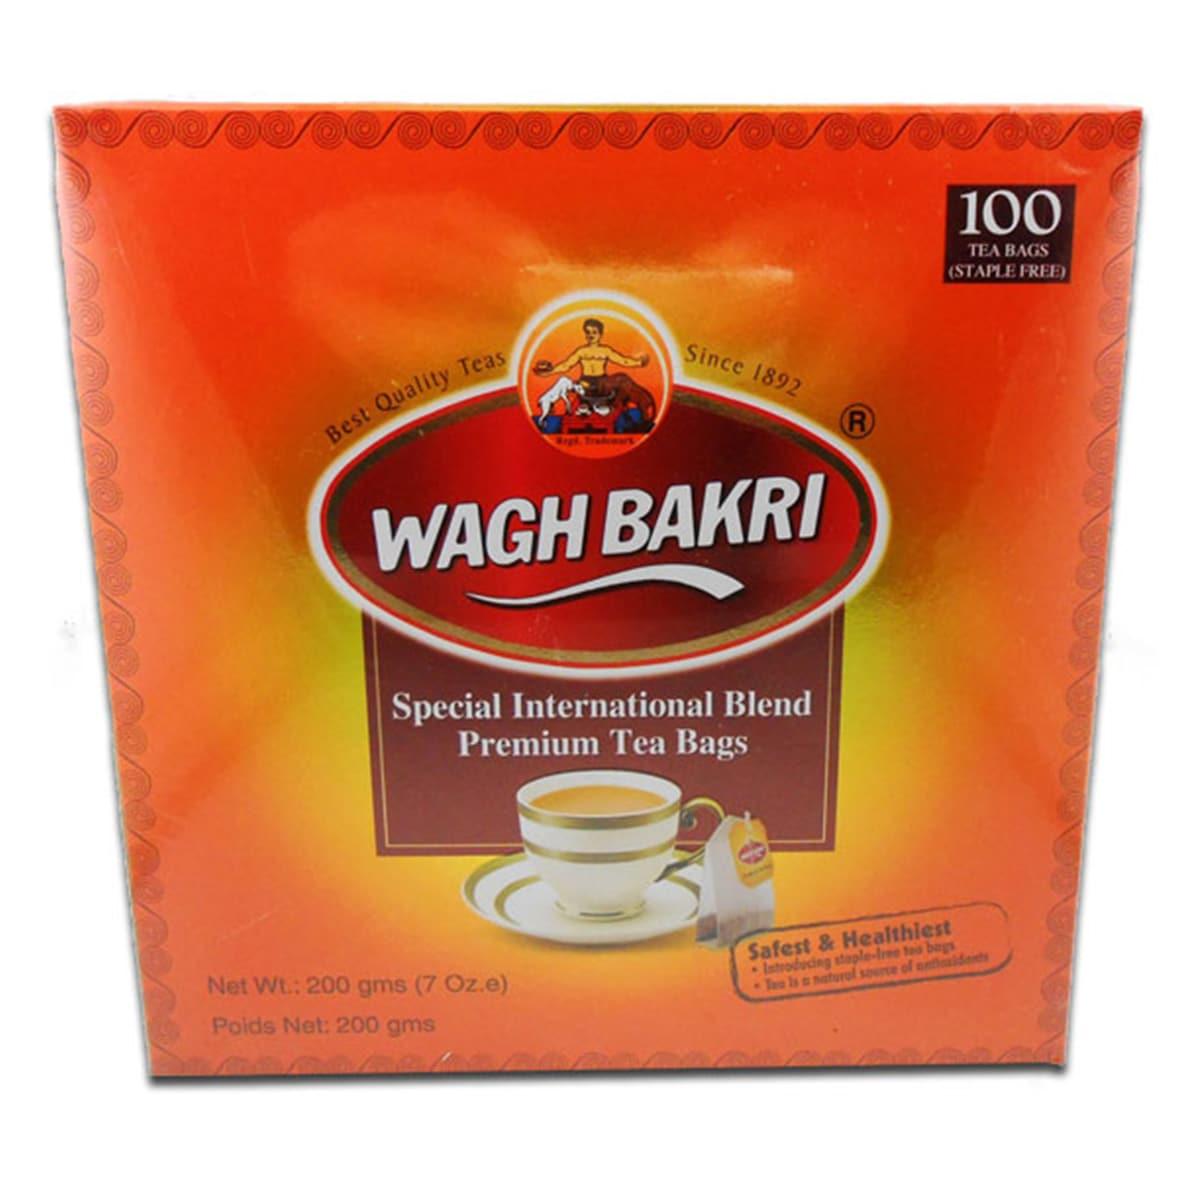 Buy Wagh Bakri Special International Blend Premium Tea (100 Tea Bags) - 200 gm